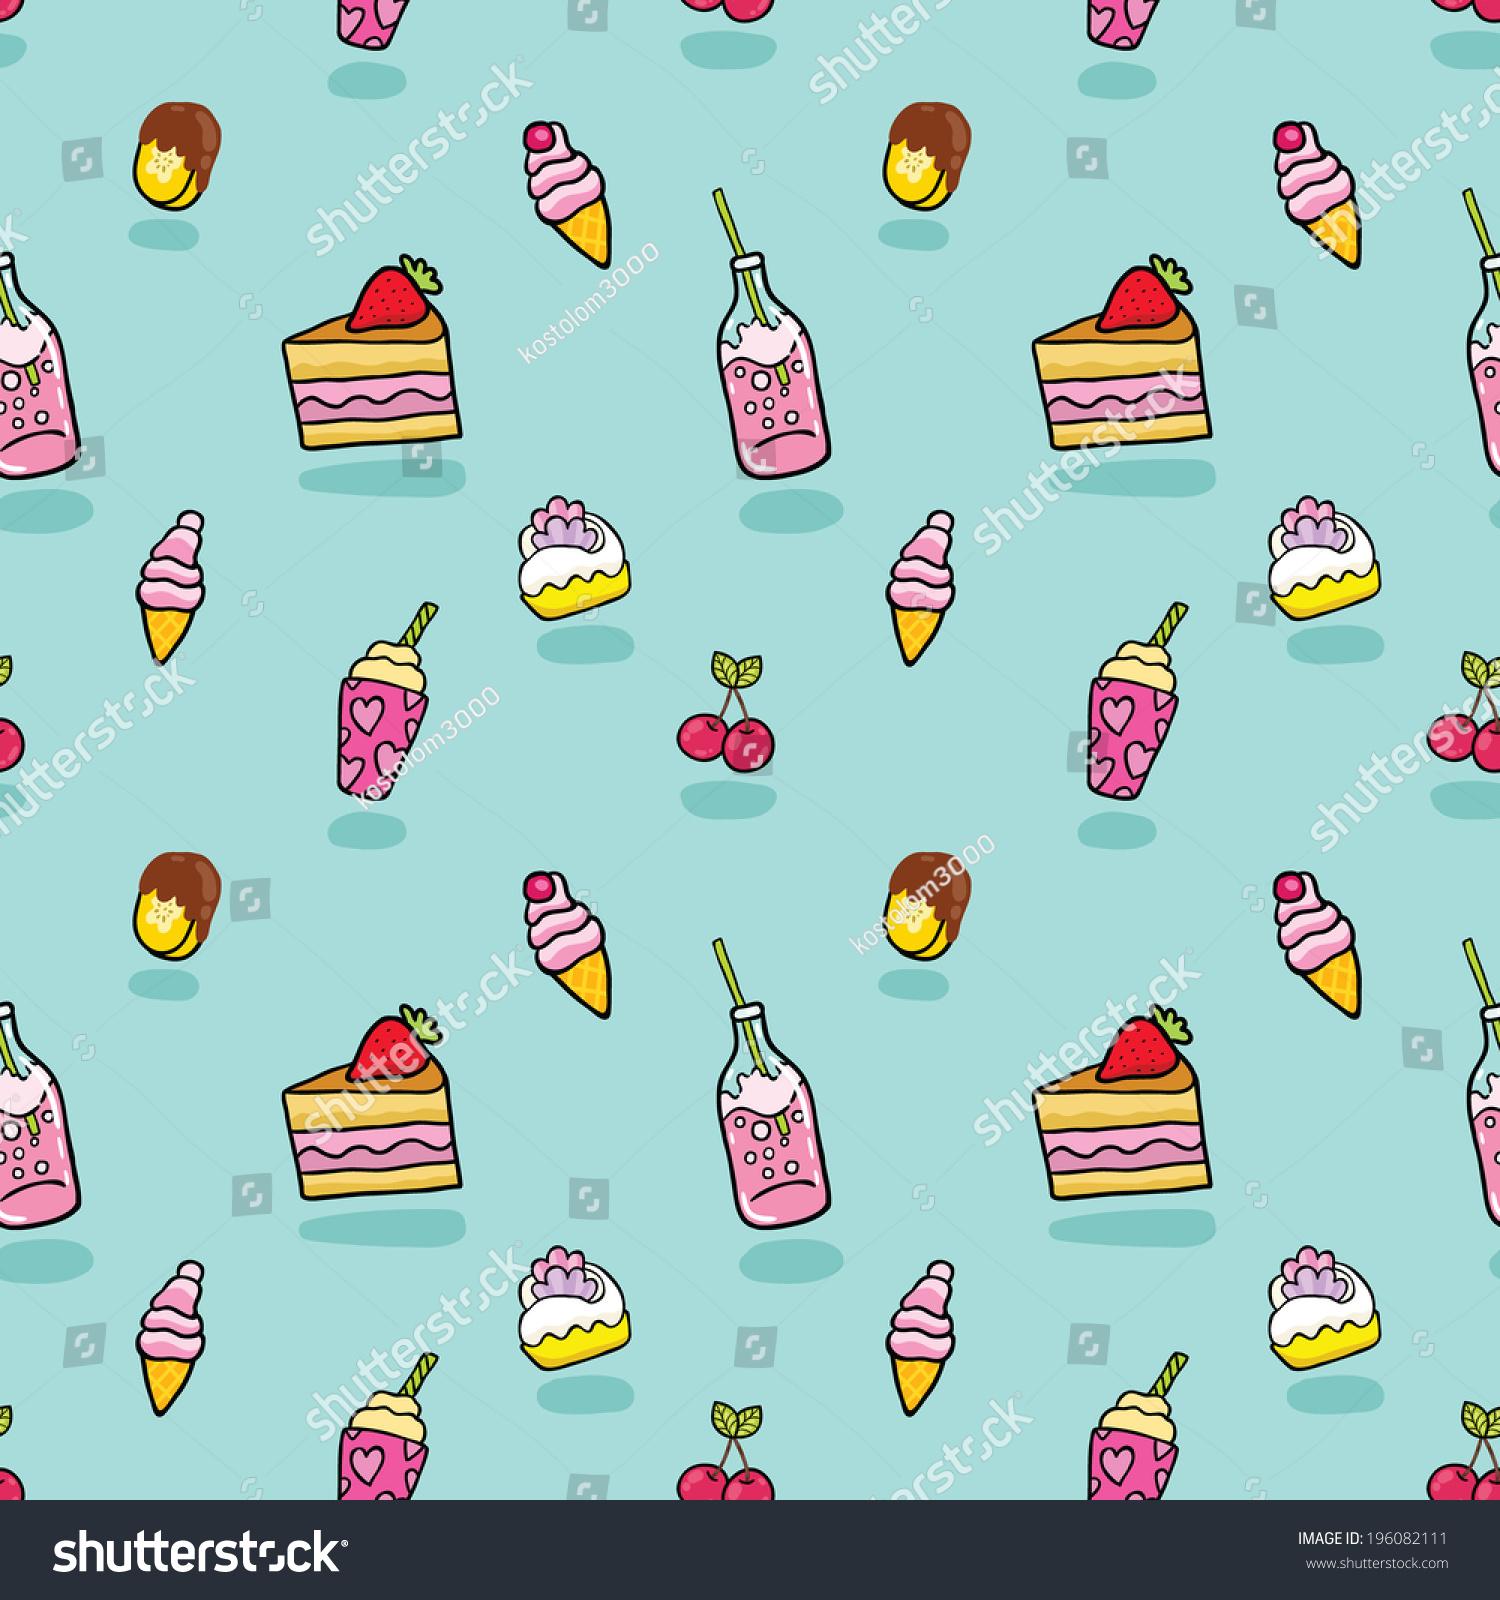 Download Cartoon Ice Cream Wallpaper Gallery: Cute Seamless Pattern With Ice Cream, Soda, Cake, Cherry